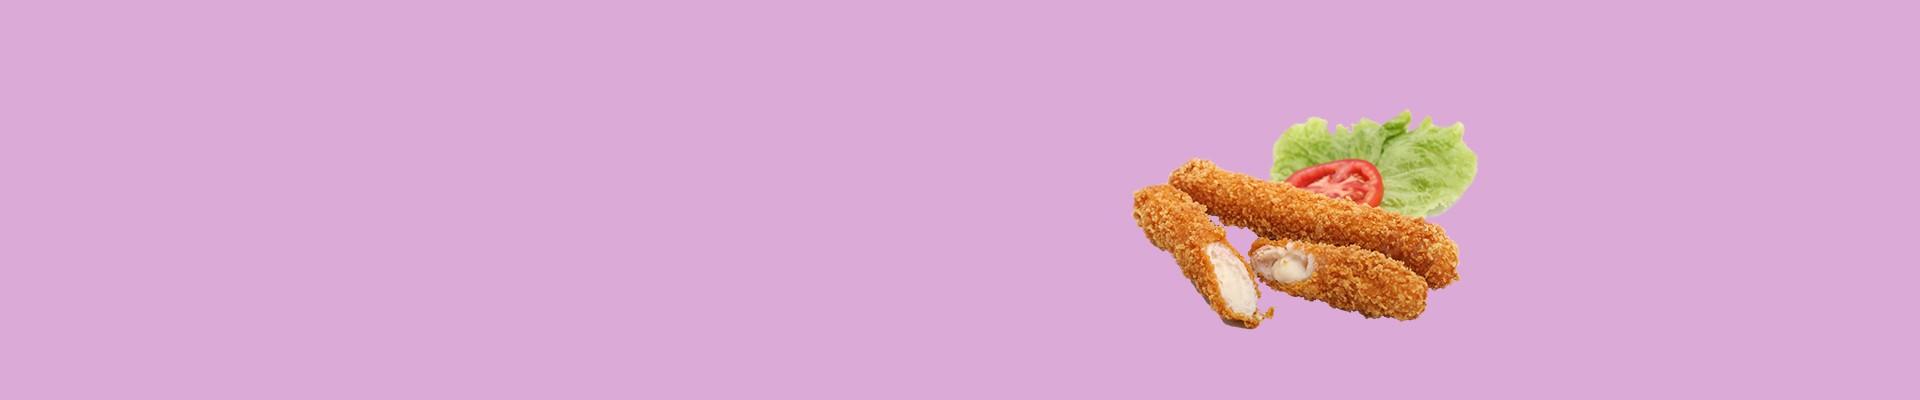 Jual Modern Snack - Harga Grosir